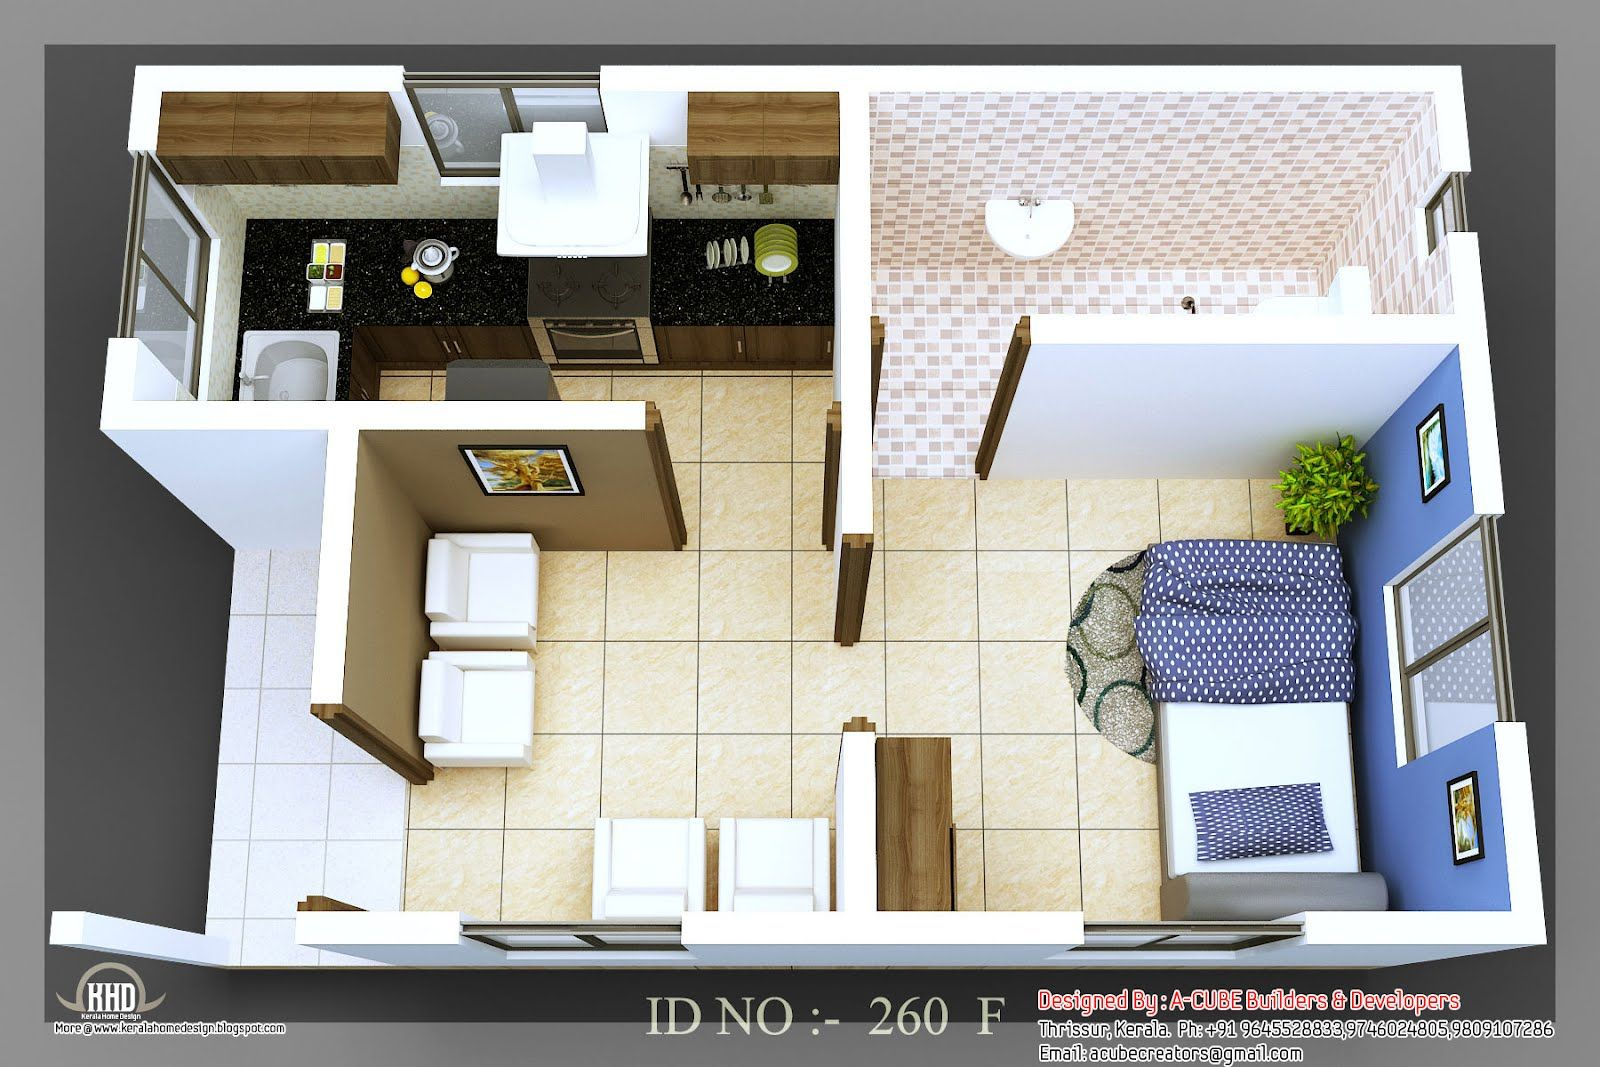 Superb Views Small House Plans Kerala Home Design Floor Plans Largest Home Design Picture Inspirations Pitcheantrous